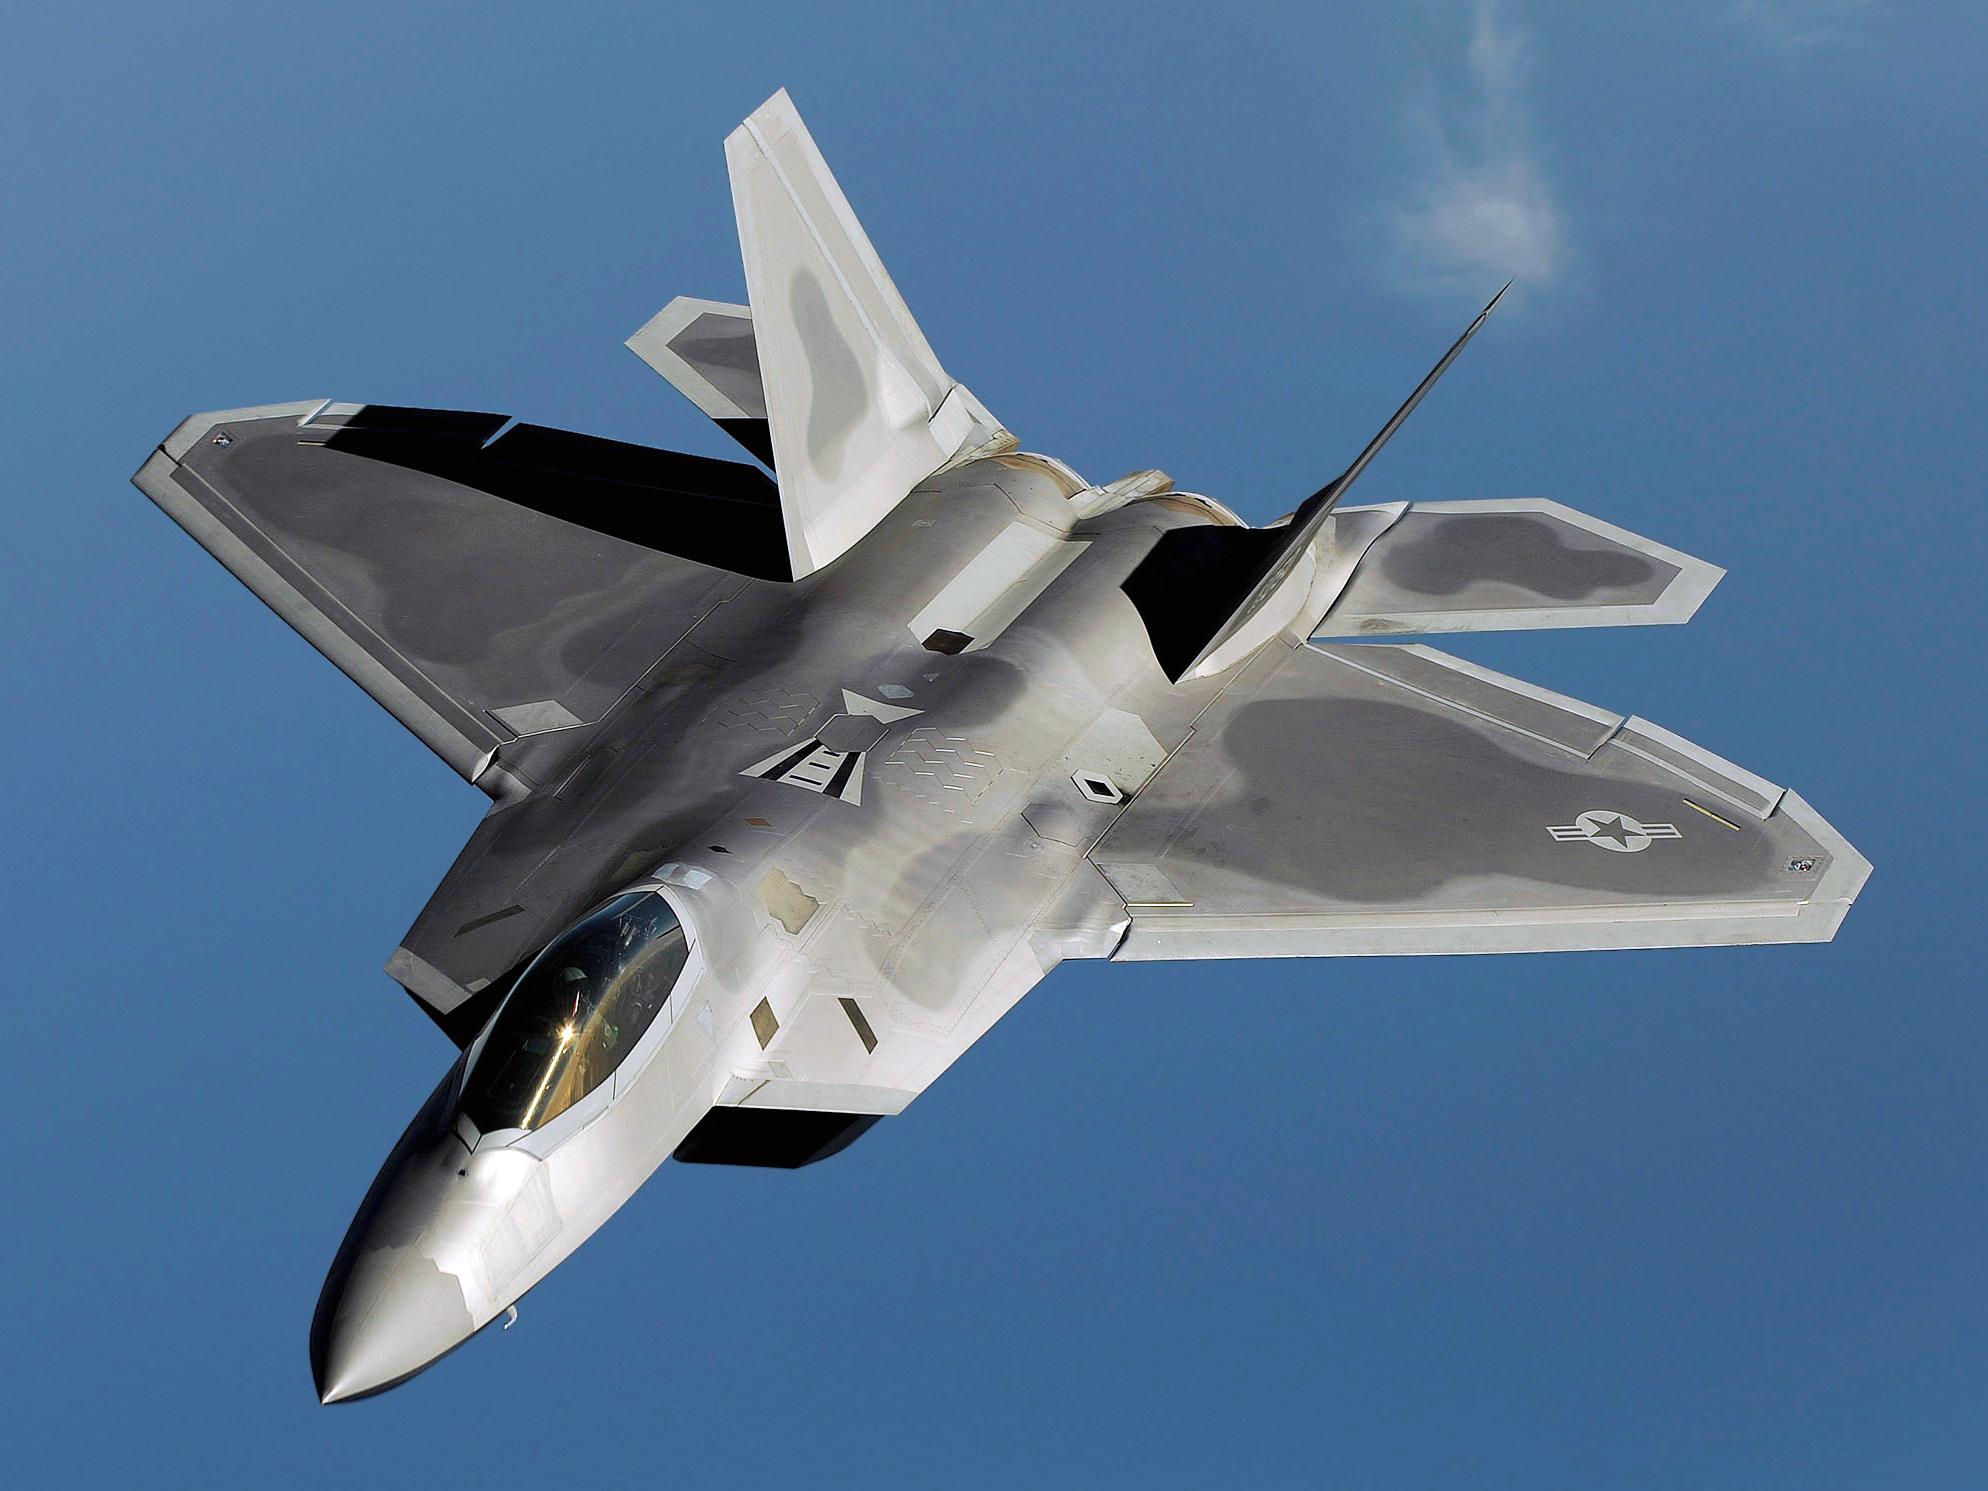 F-22_Raptor_edit1_(cropped).jpg